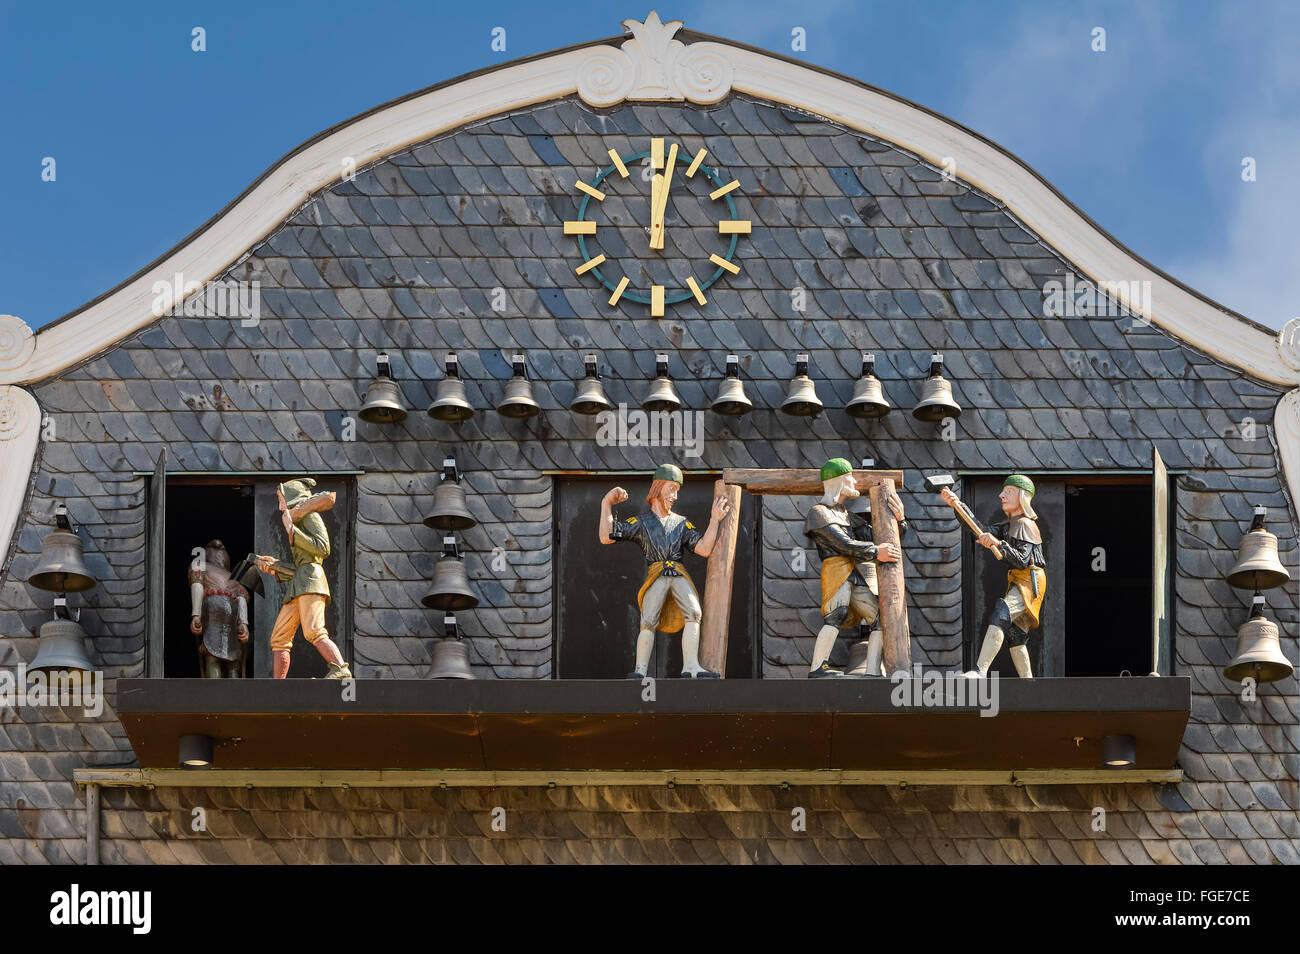 Carillon, Goslar, Harz, Lower Saxony, Germany, Unesco World Heritage Site Stock Photo